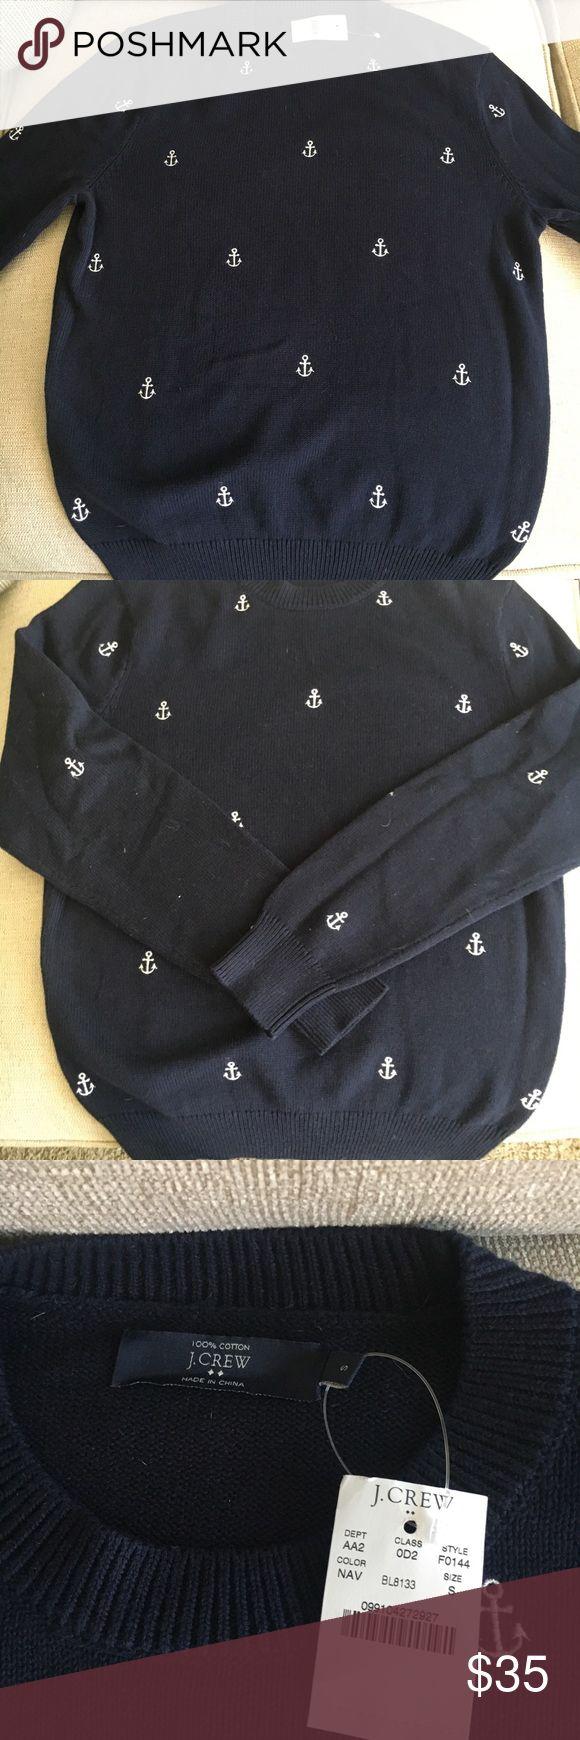 Men's Blue & White Small J Crew Anchor Sweater Men's Small Blue & White J Crew Anchor Sweater with tags; never worn J. Crew Sweaters Crewneck